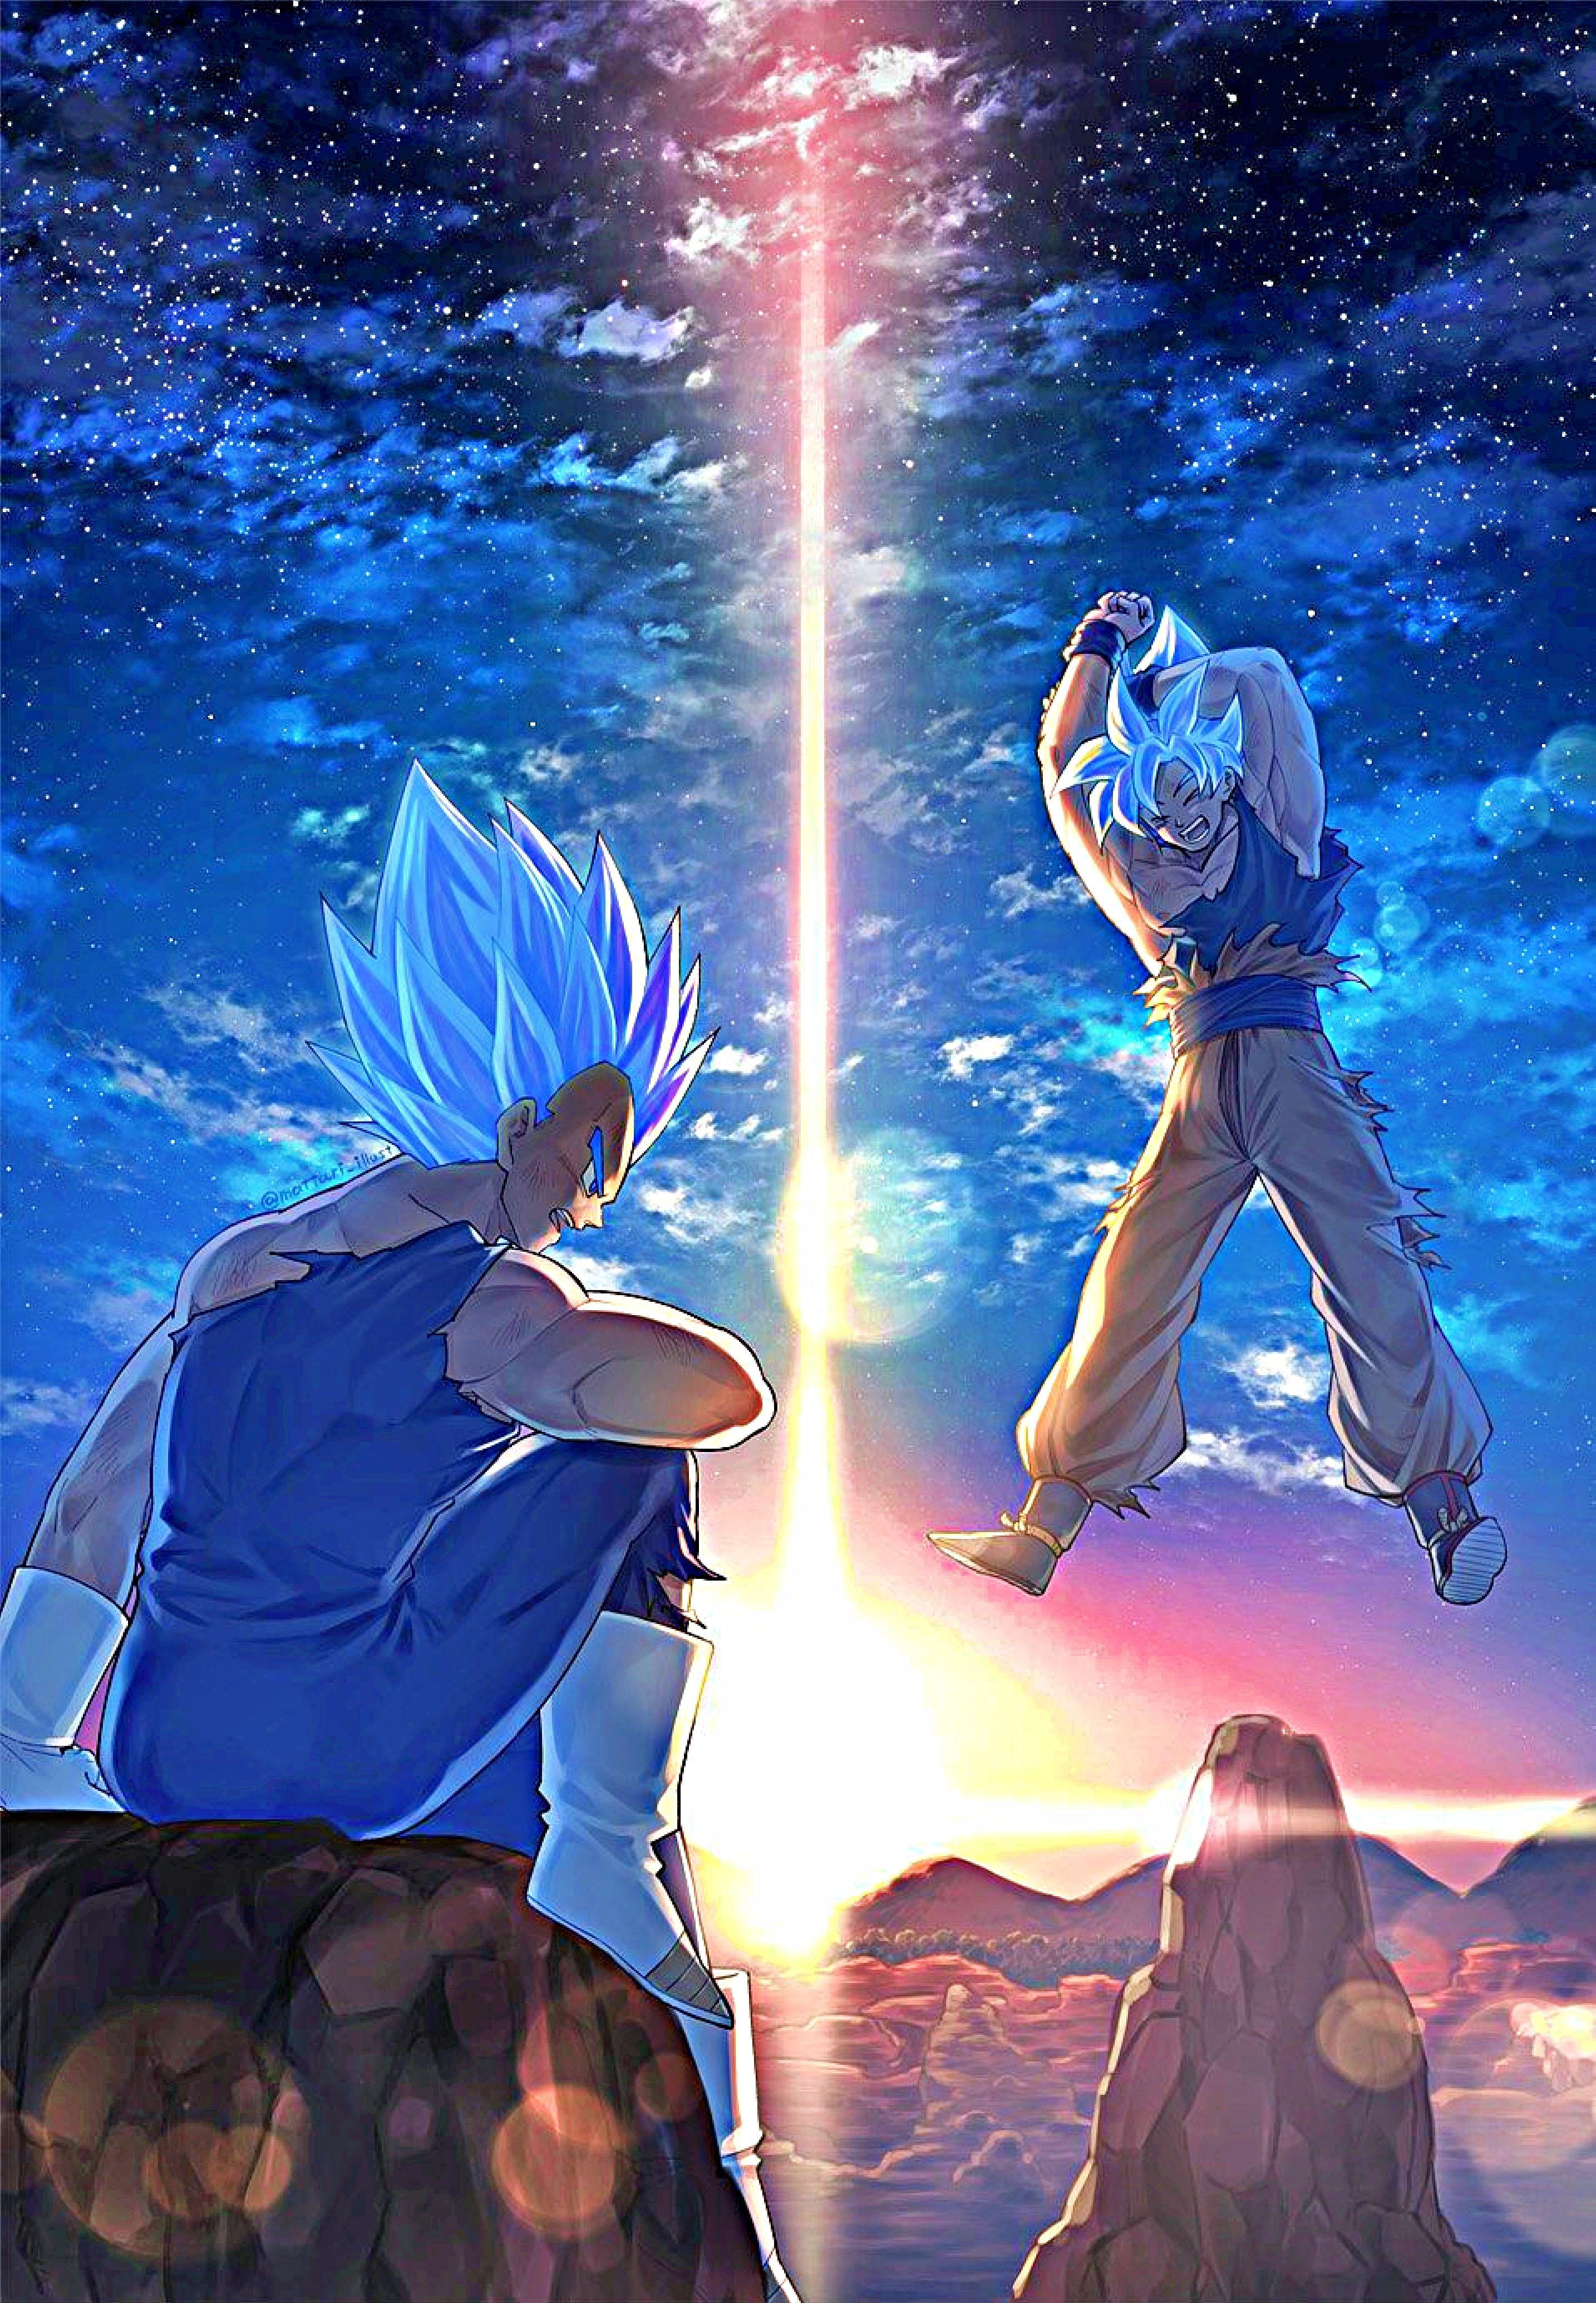 GGHimSELF ノ ◒ ▿ ◒ ノ   Dragon ball super artwork, Dragon ...